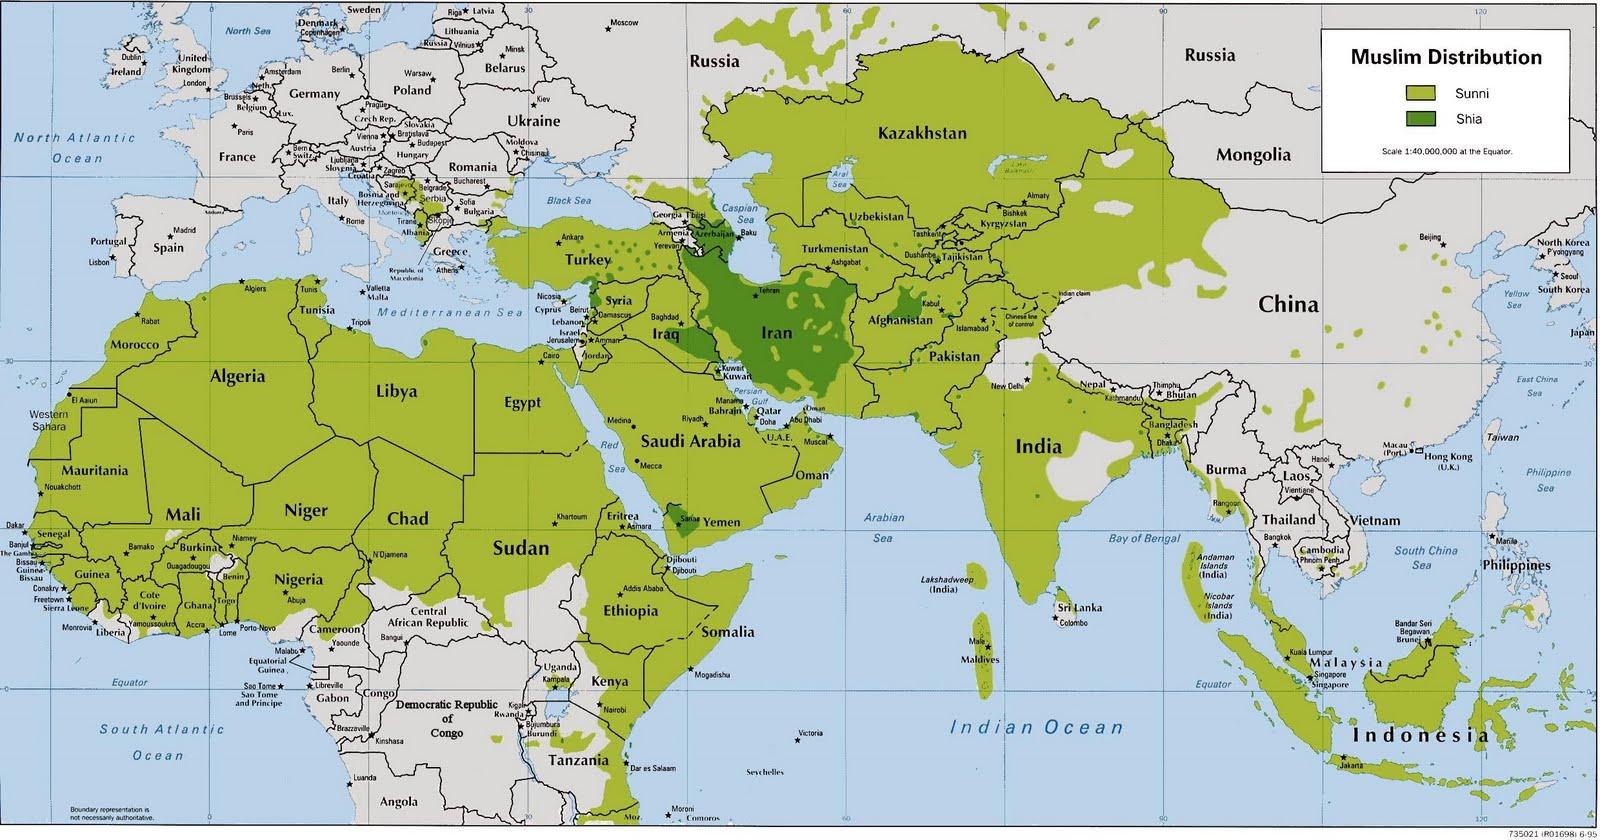 MARXIST: Yemen, Geography on map of japan rivers, map of antarctica rivers, map of eurasia rivers, map of nicaragua rivers, map of iraq rivers, map of mexico rivers, map of ireland rivers, map of north america rivers, map of the usa rivers, map of eastern europe rivers, map of central asia rivers, map of azerbaijan rivers, map of south east asia rivers, map of sub-saharan africa rivers, map of eastern mediterranean rivers, map of france rivers, map of india rivers, map of western europe rivers, map of u.s. rivers, map of east europe rivers,